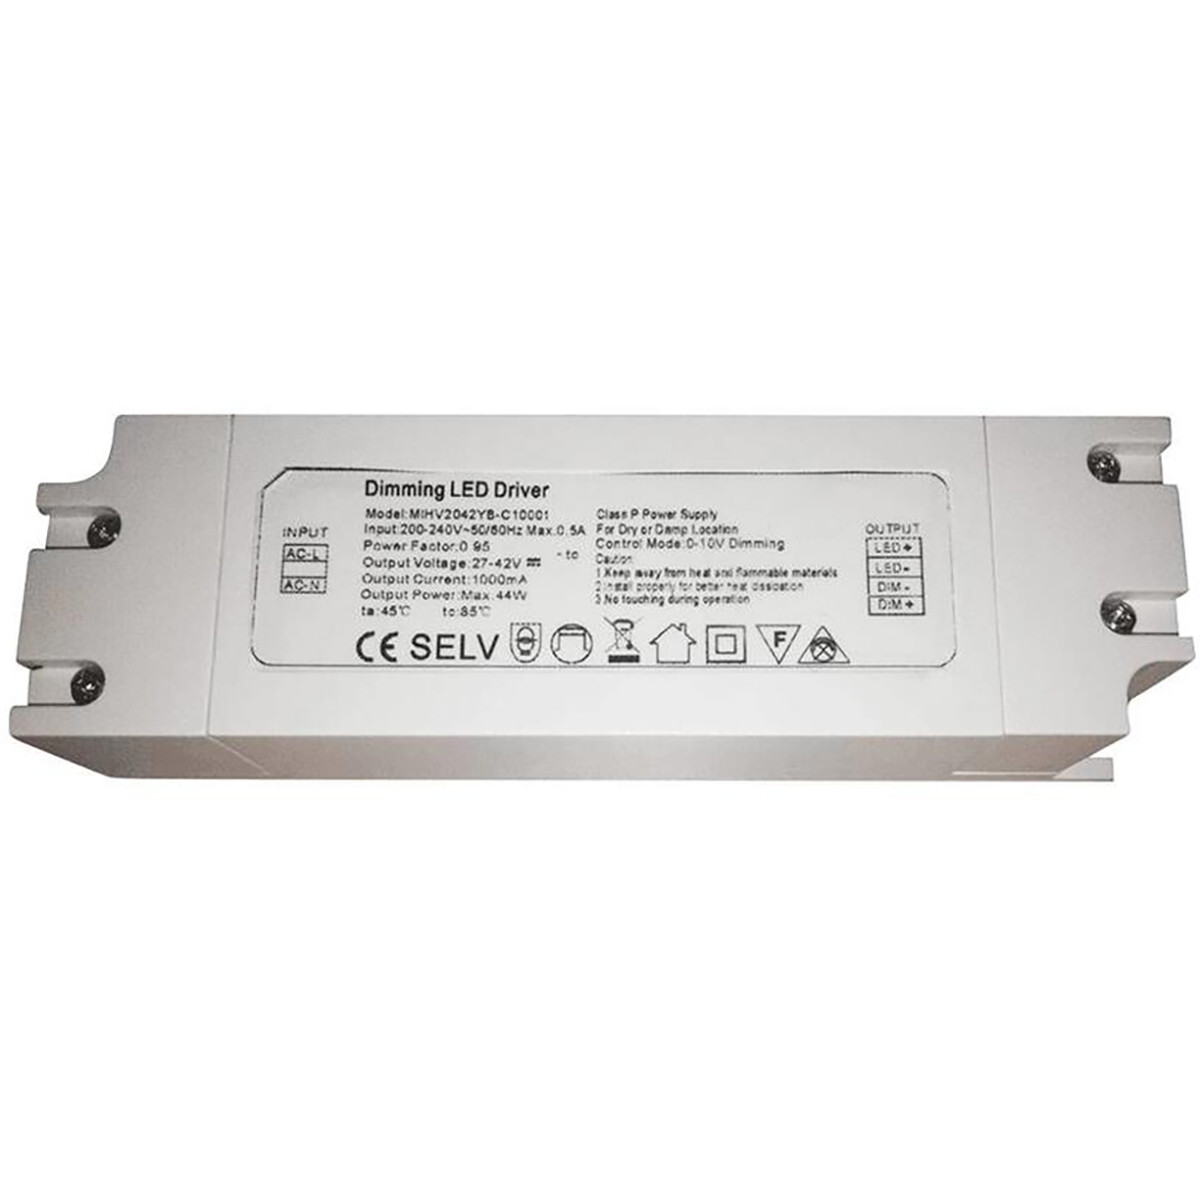 LED Driver - Aigi - Dimbaar - 40W - 1-10V